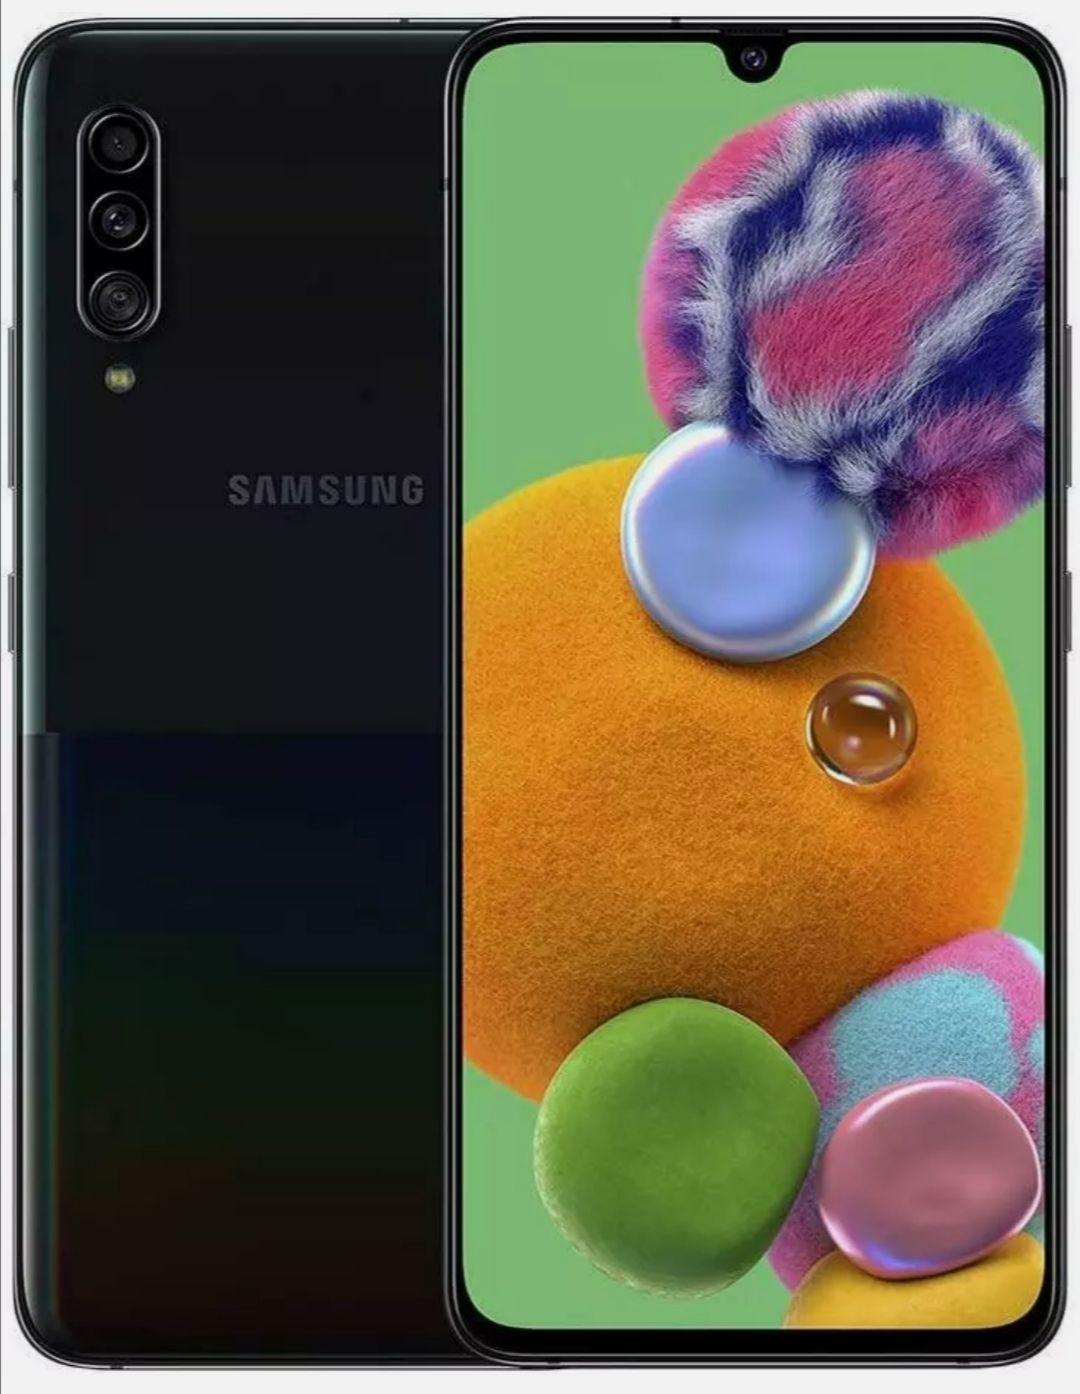 Grade A Refurbished (12m Warranty) Samsung Galaxy A90 (2019) 5G 128GB Unlocked Black/White Smartphone - £237.99 @ XS Items / Ebay